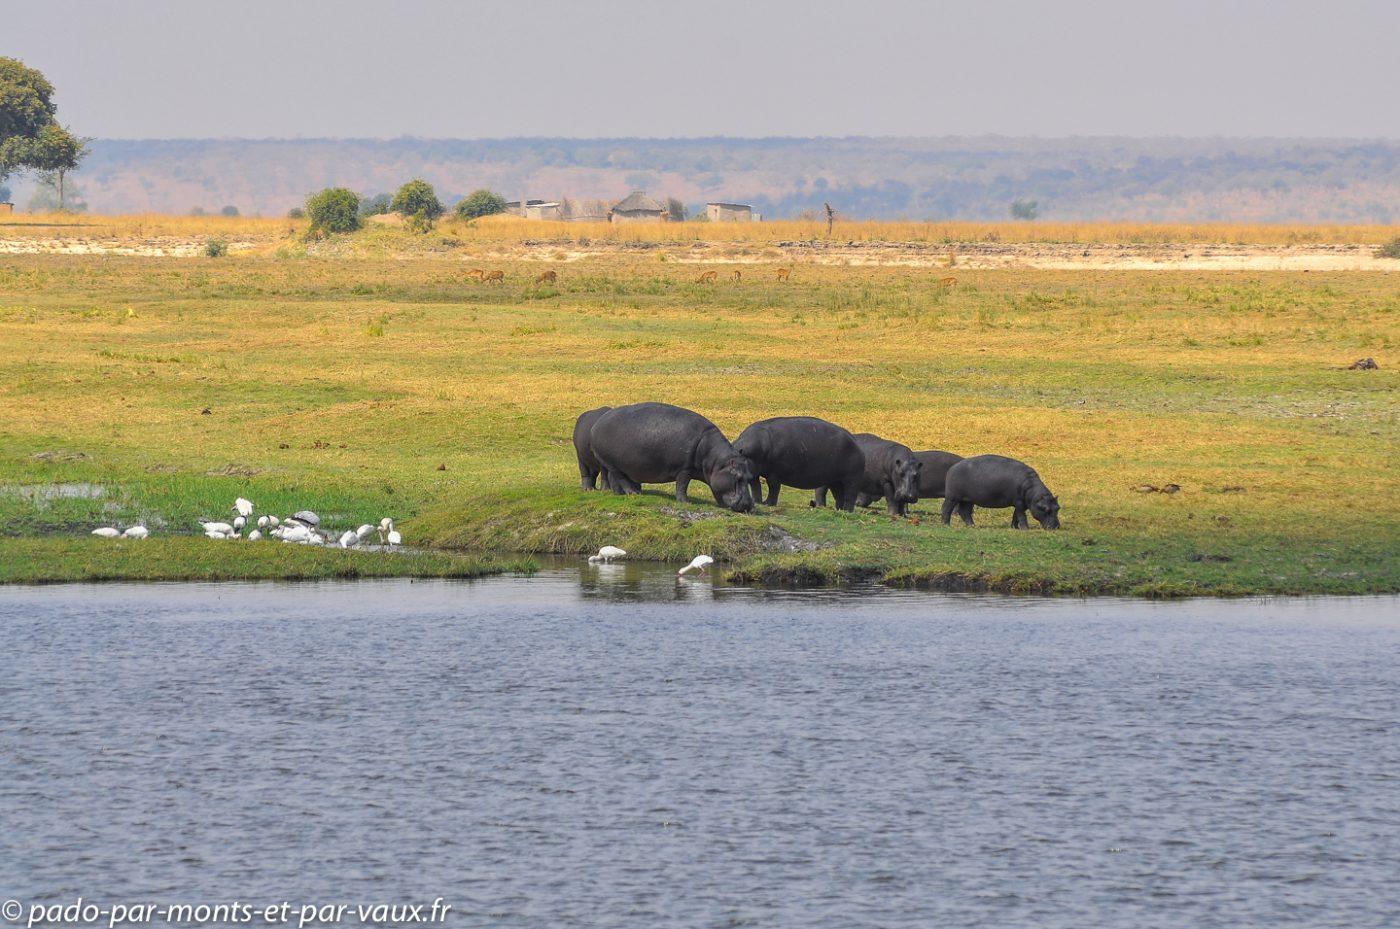 Rivière Chobe - hippopotames